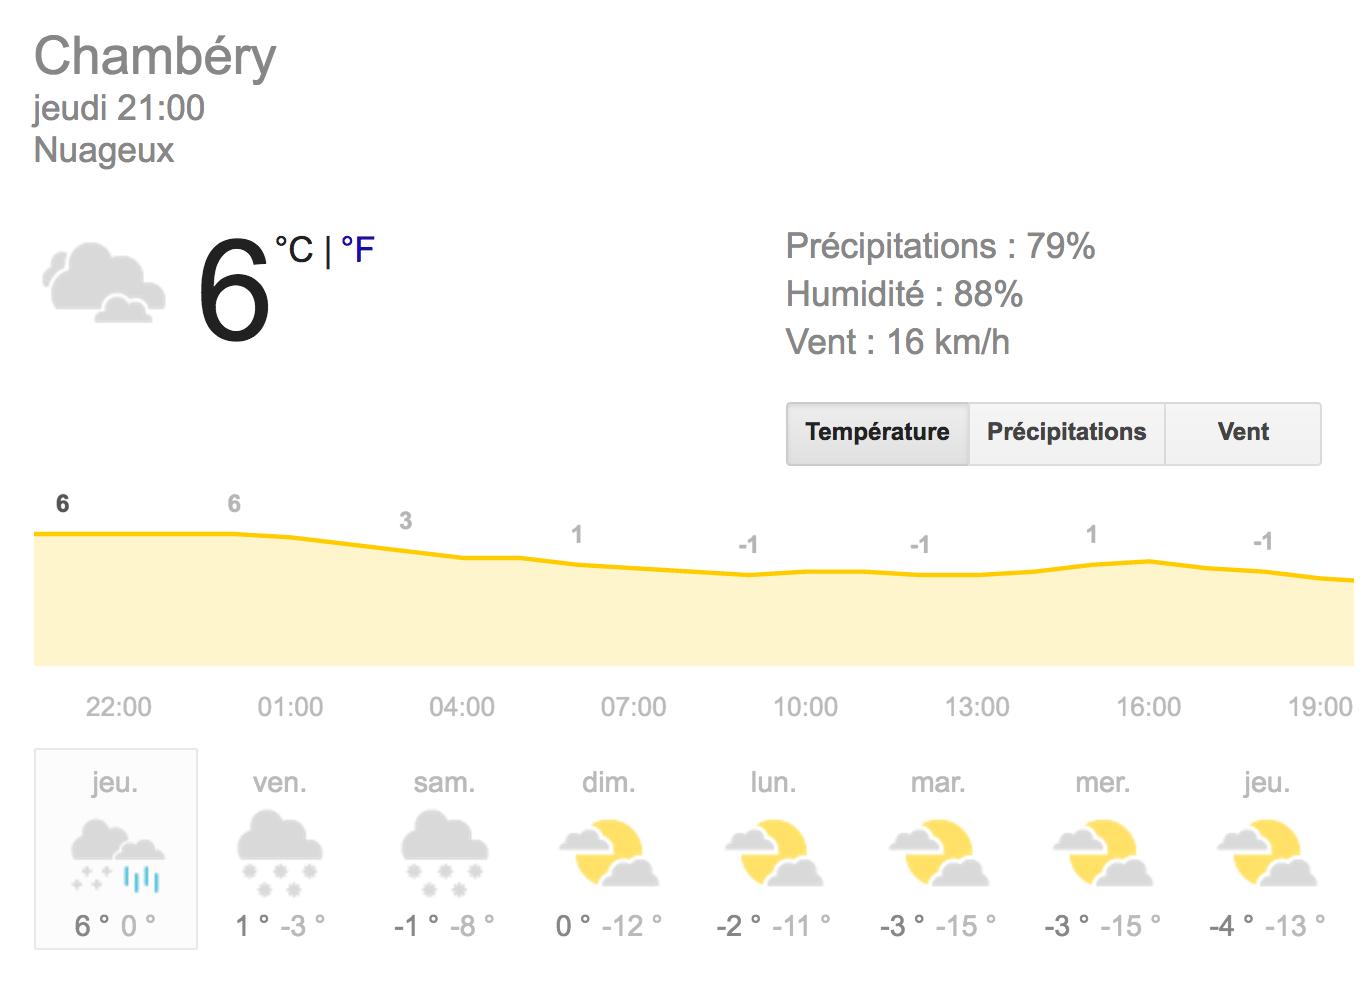 le froid la semaine prochaine